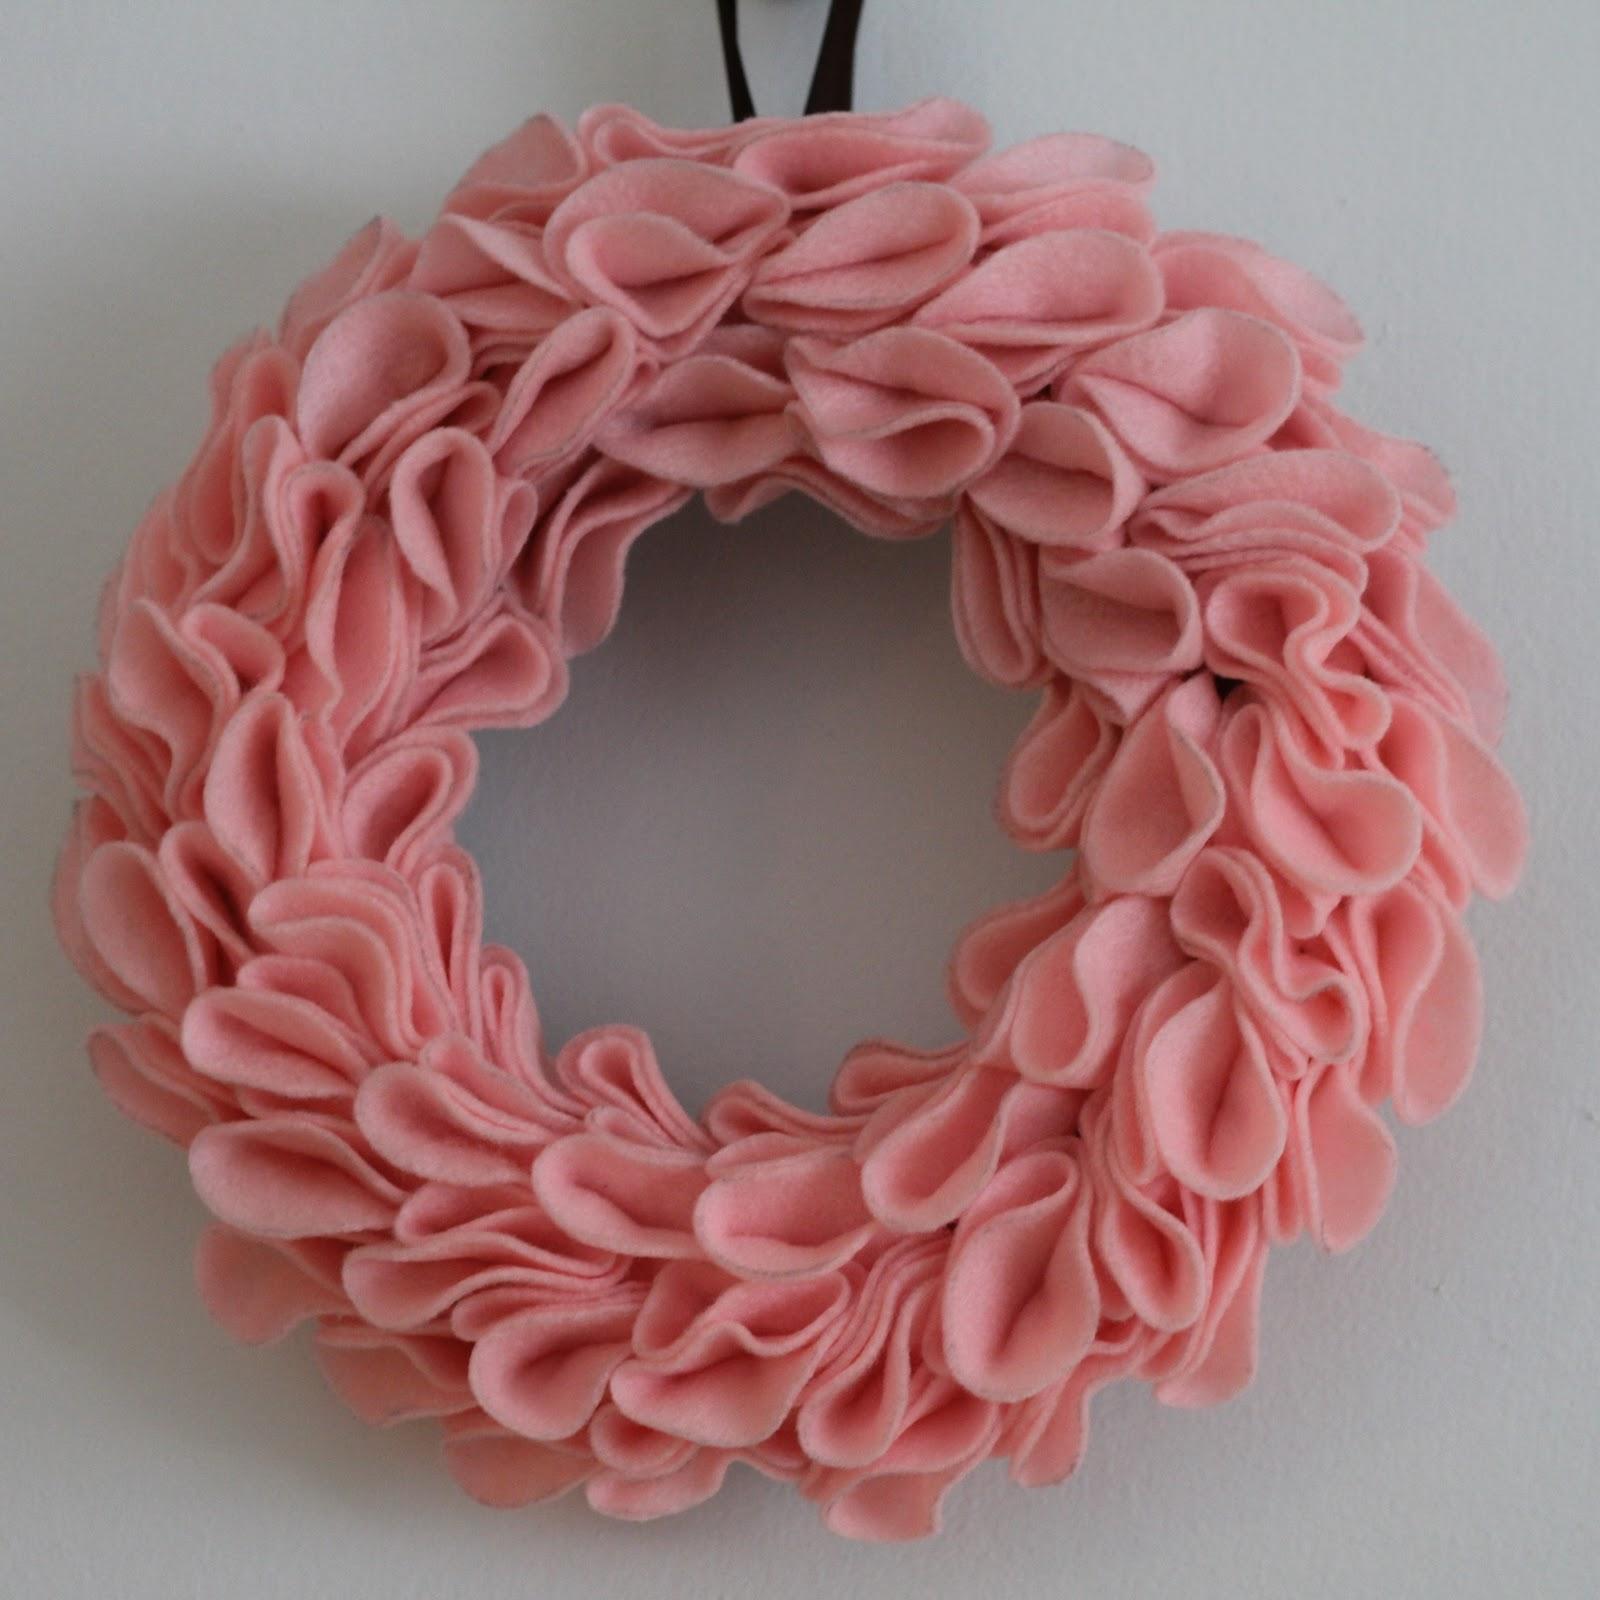 Dill Pickle Design Felt Rosette Wreath 1st Attempt